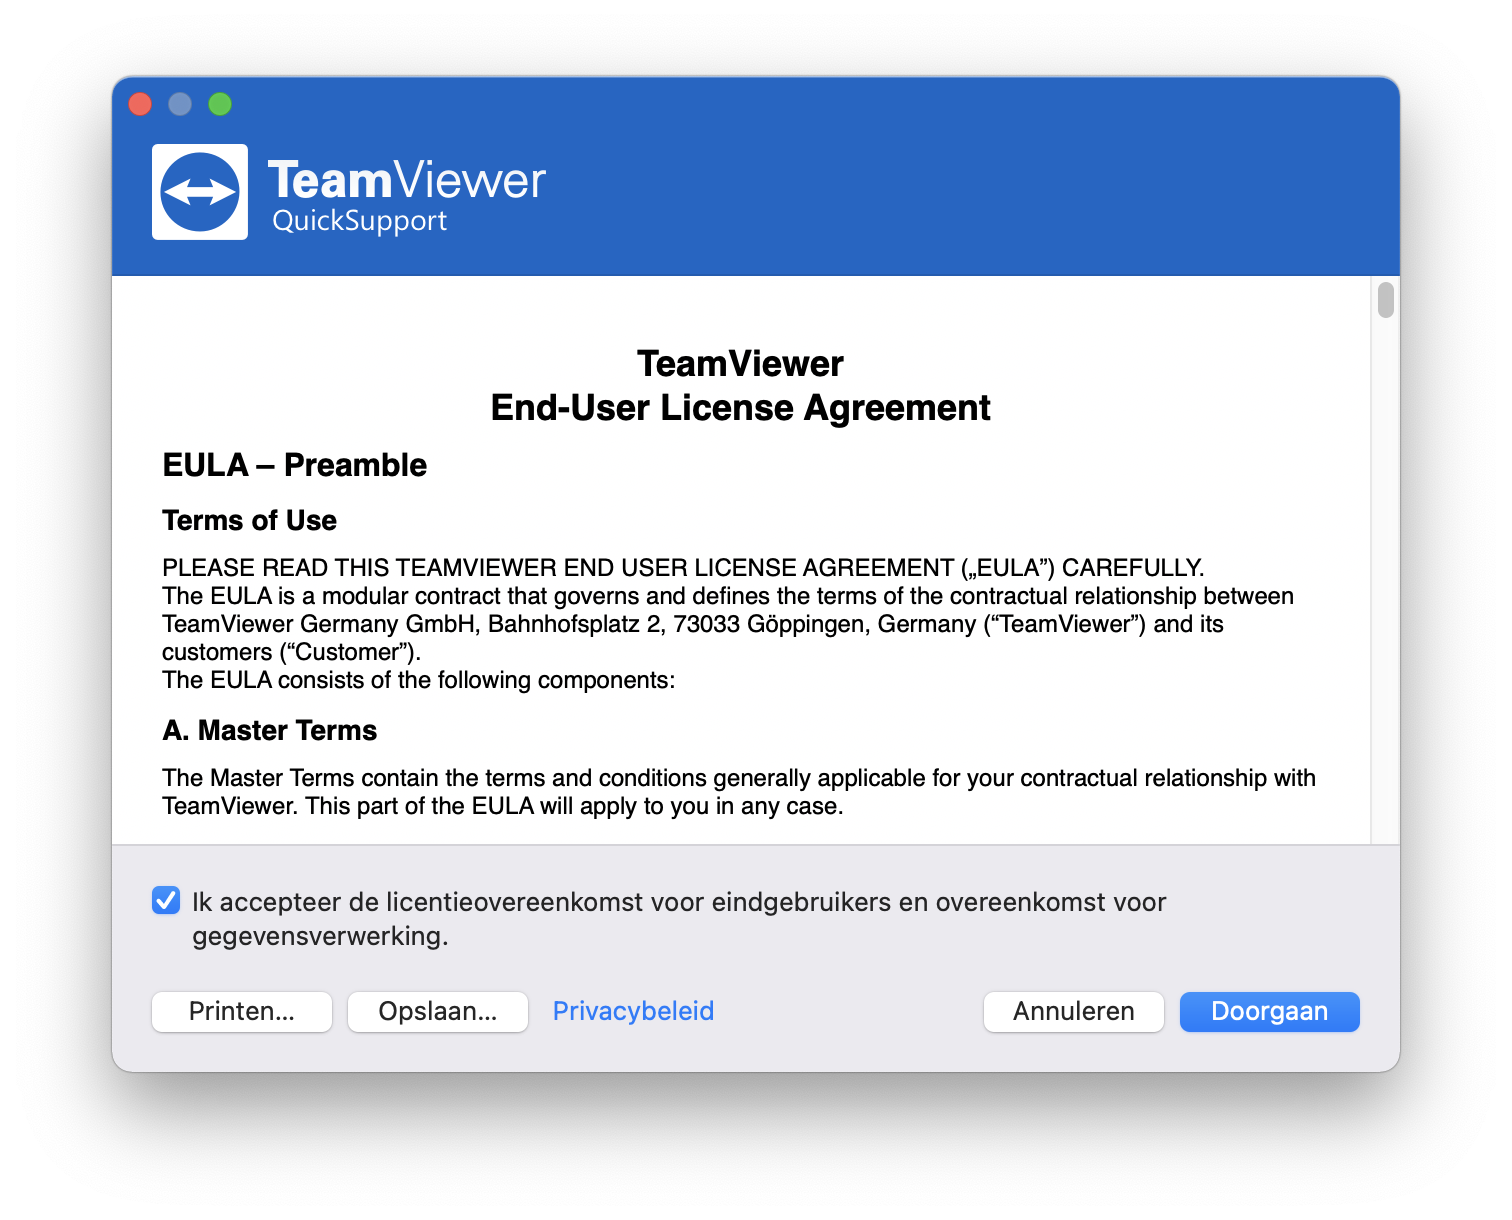 Stap 4: Bevestig de License Agreement